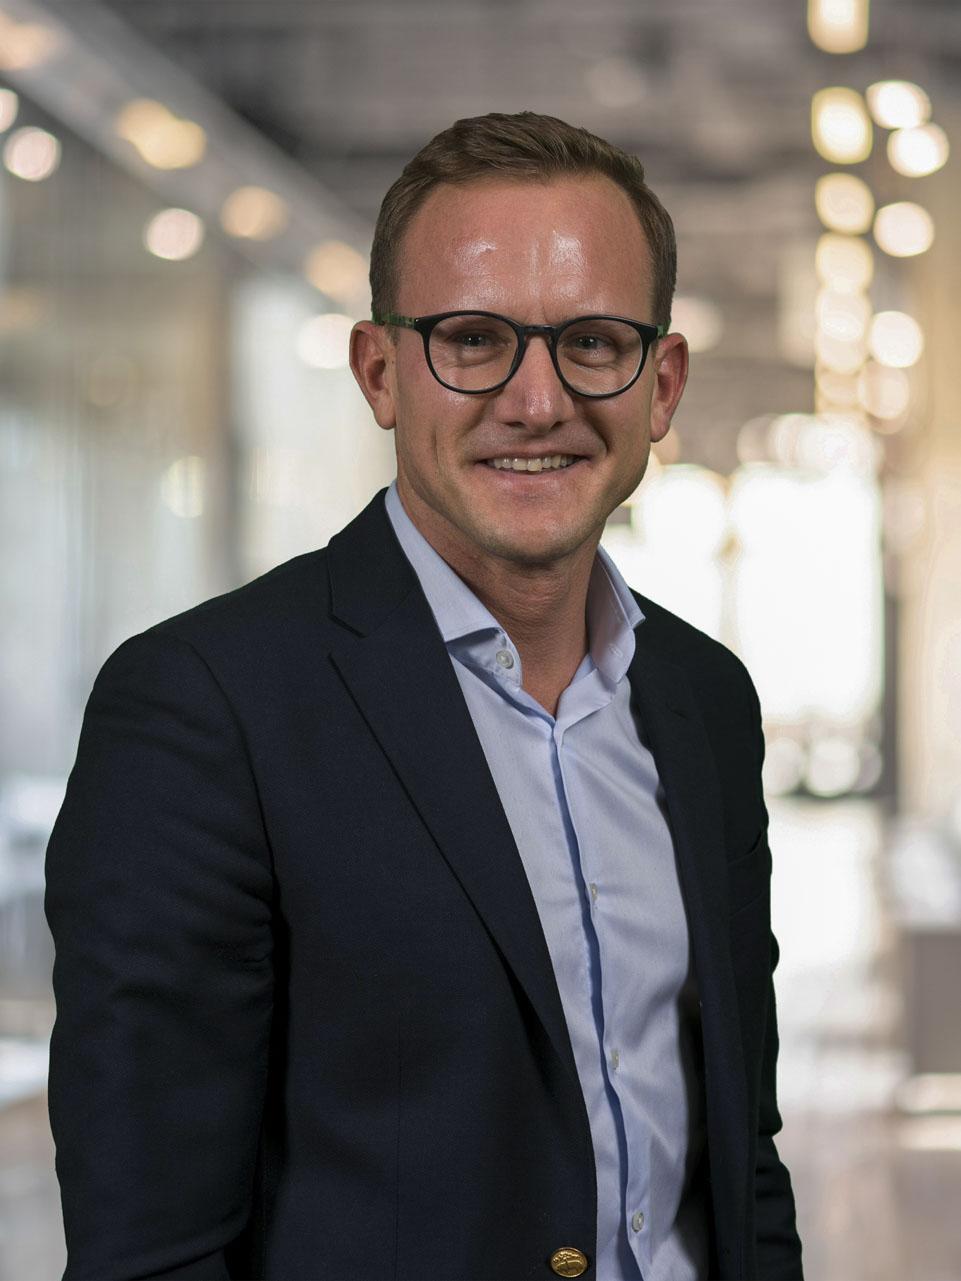 Salzburger Notariatskammer: Notar Mag. Dr. Christian Bonimaier MBL